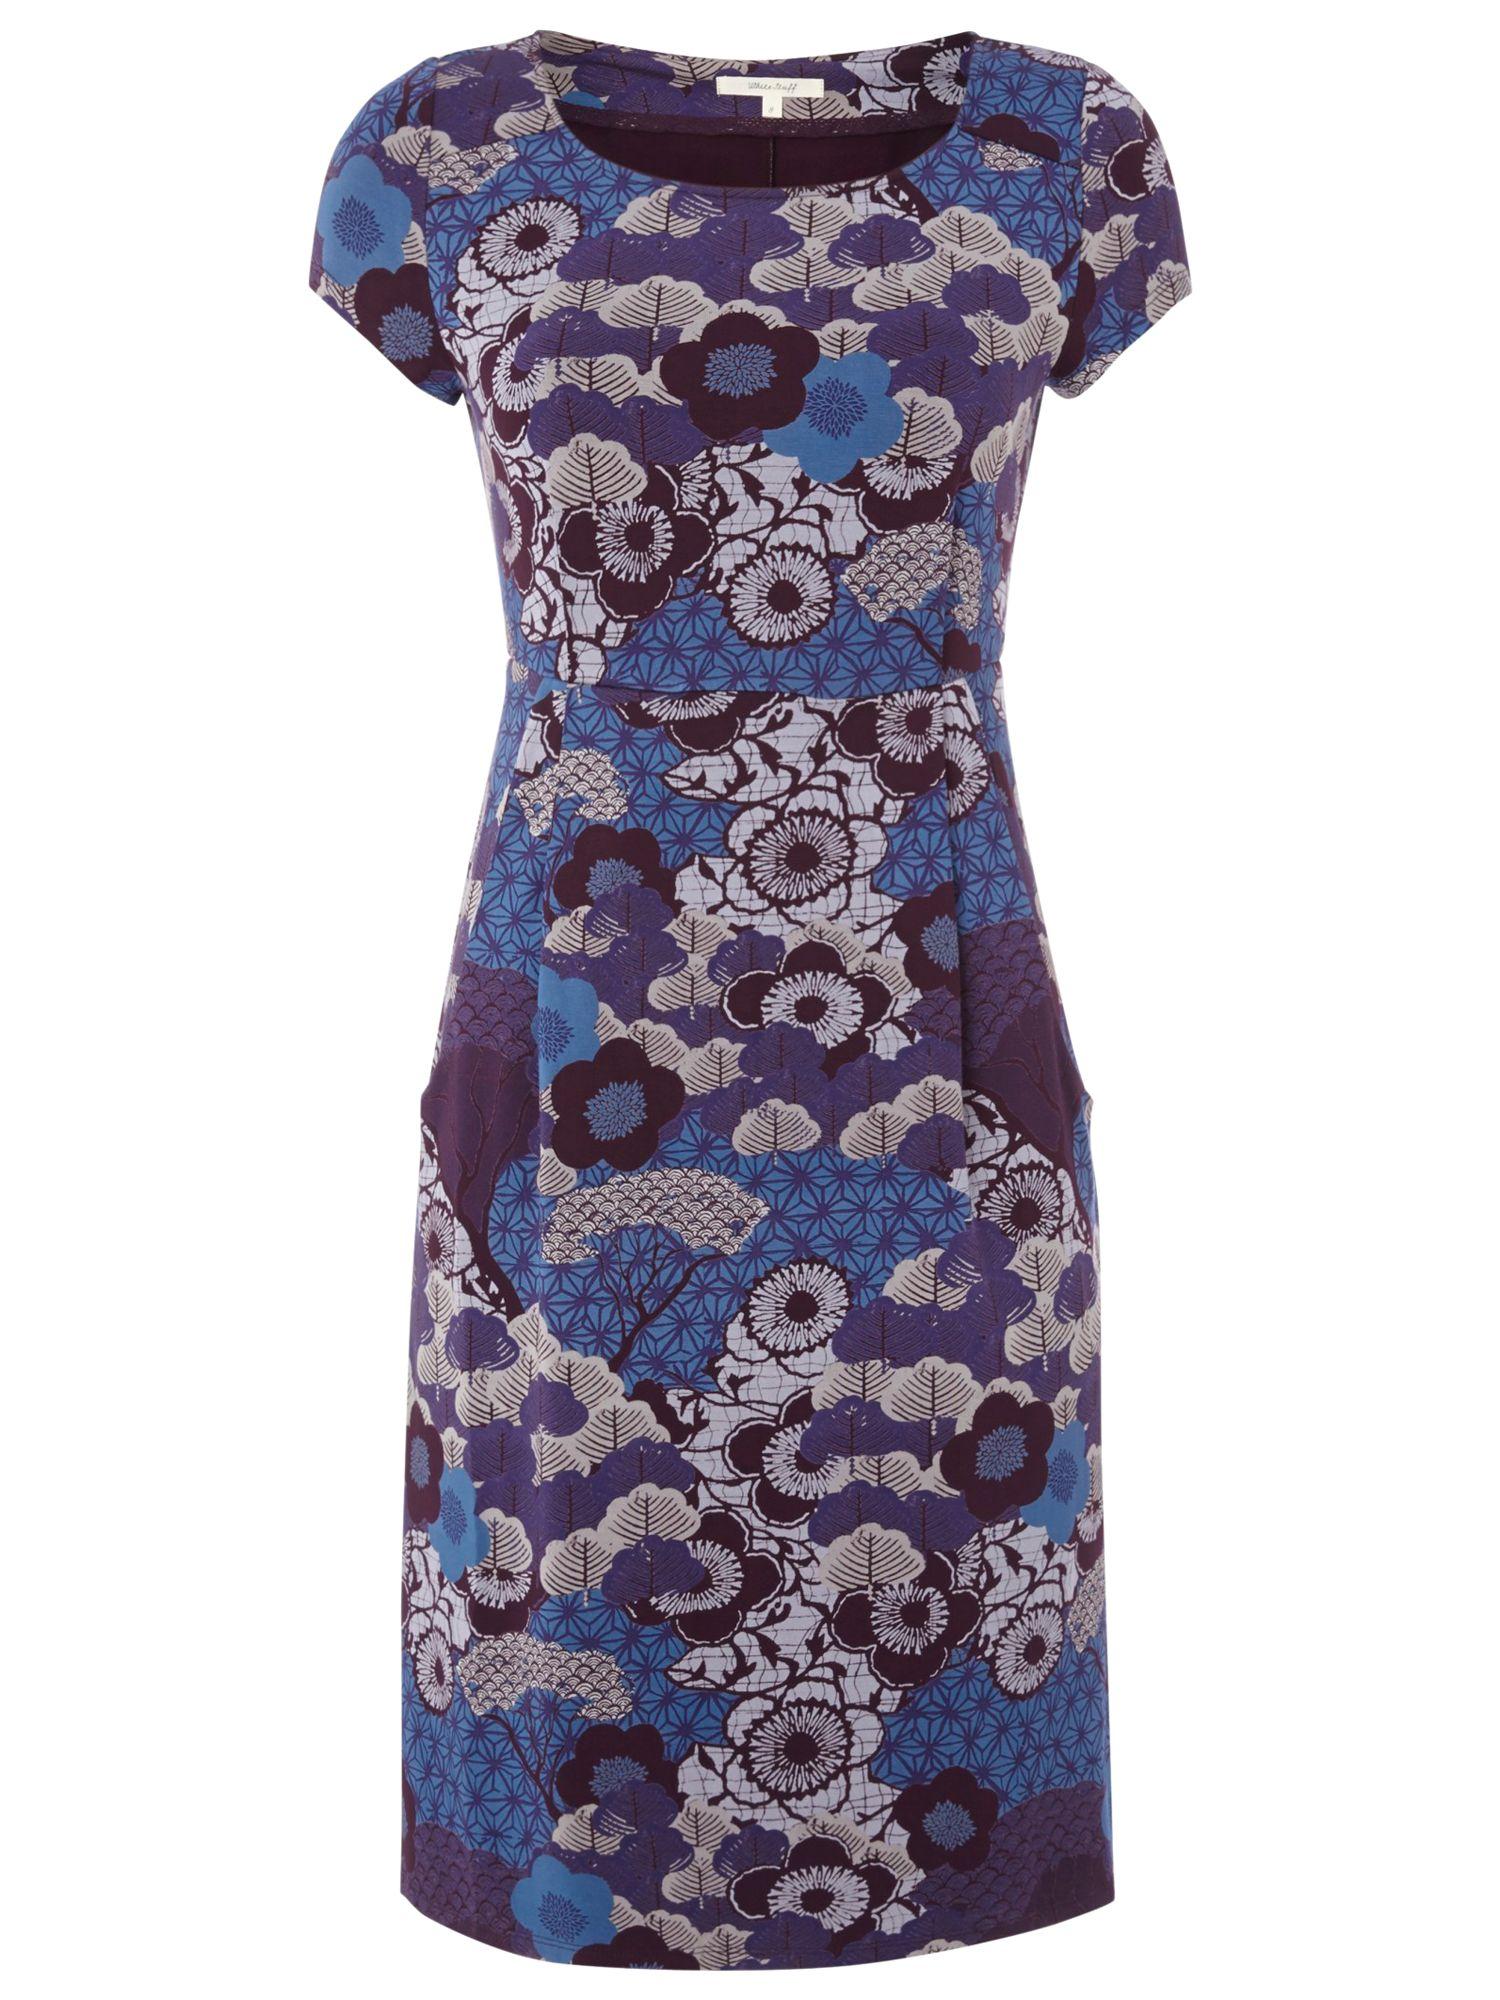 white stuff tea time dress purple orchid, white, stuff, tea, time, dress, purple, orchid, white stuff, 16|18|10|12|14|8, women, womens dresses, brands l-z, 1885365